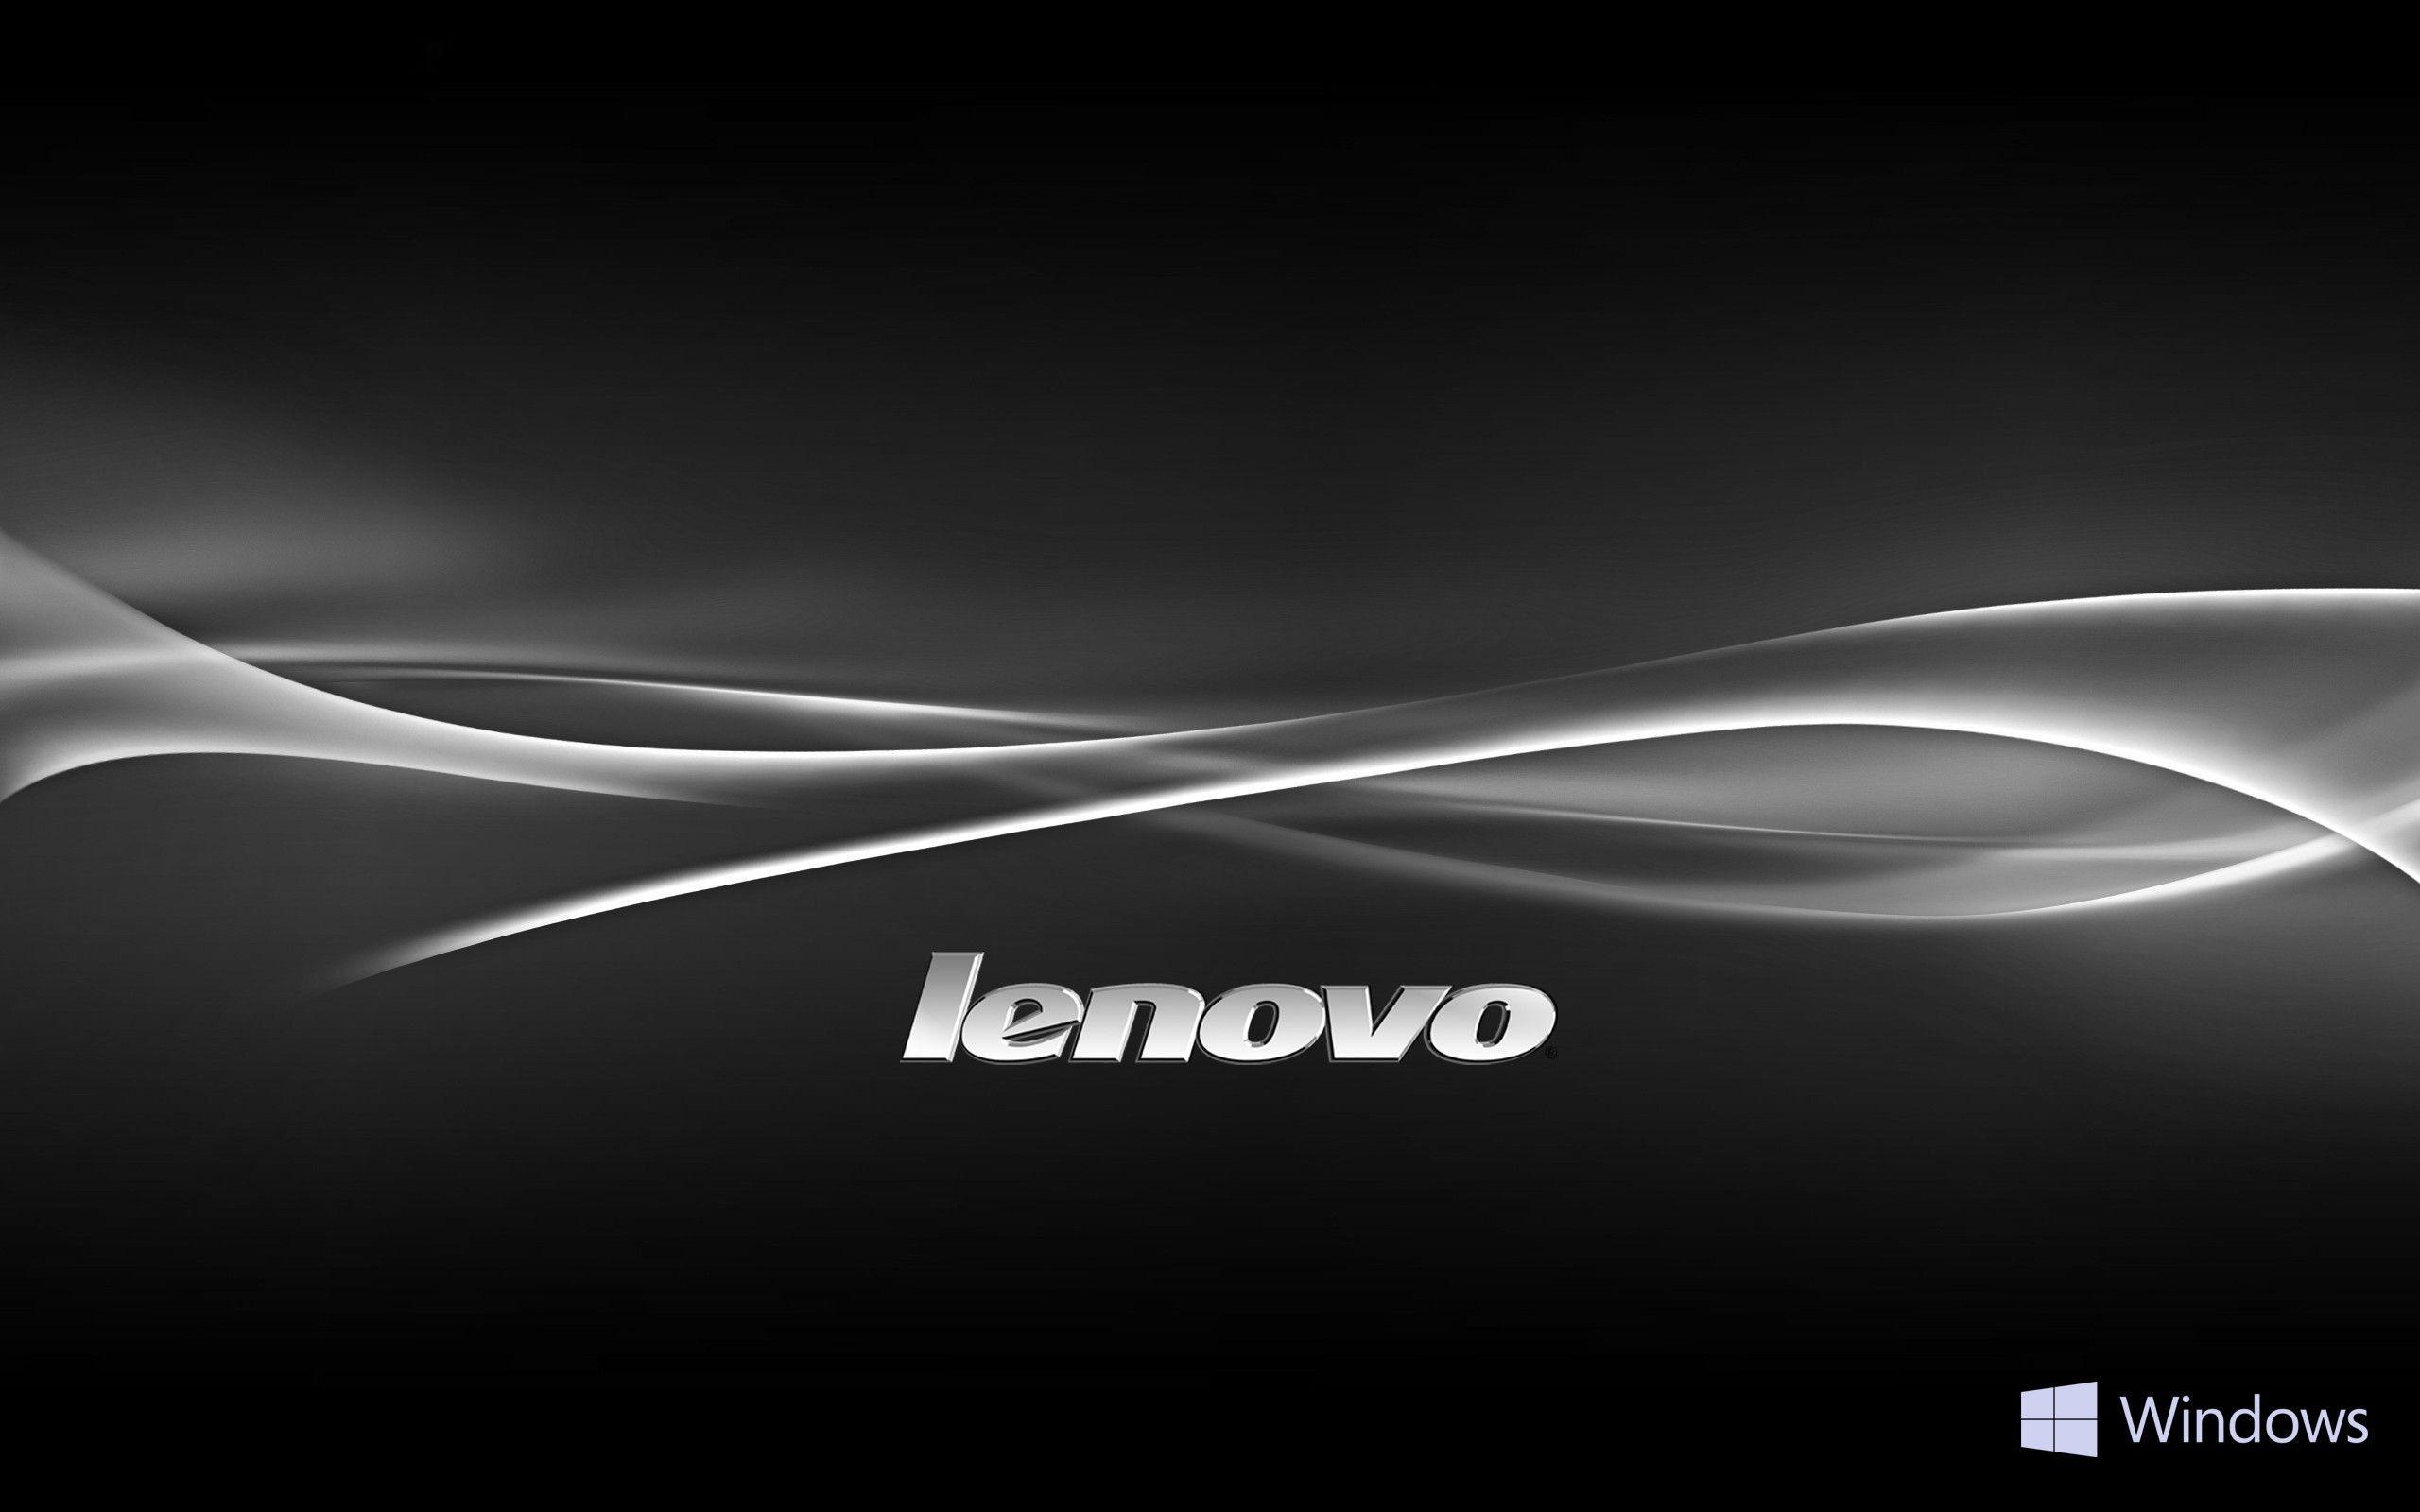 Beautiful Lenovo New Logo Wallpaper   Laptop wallpaper, Lenovo ...